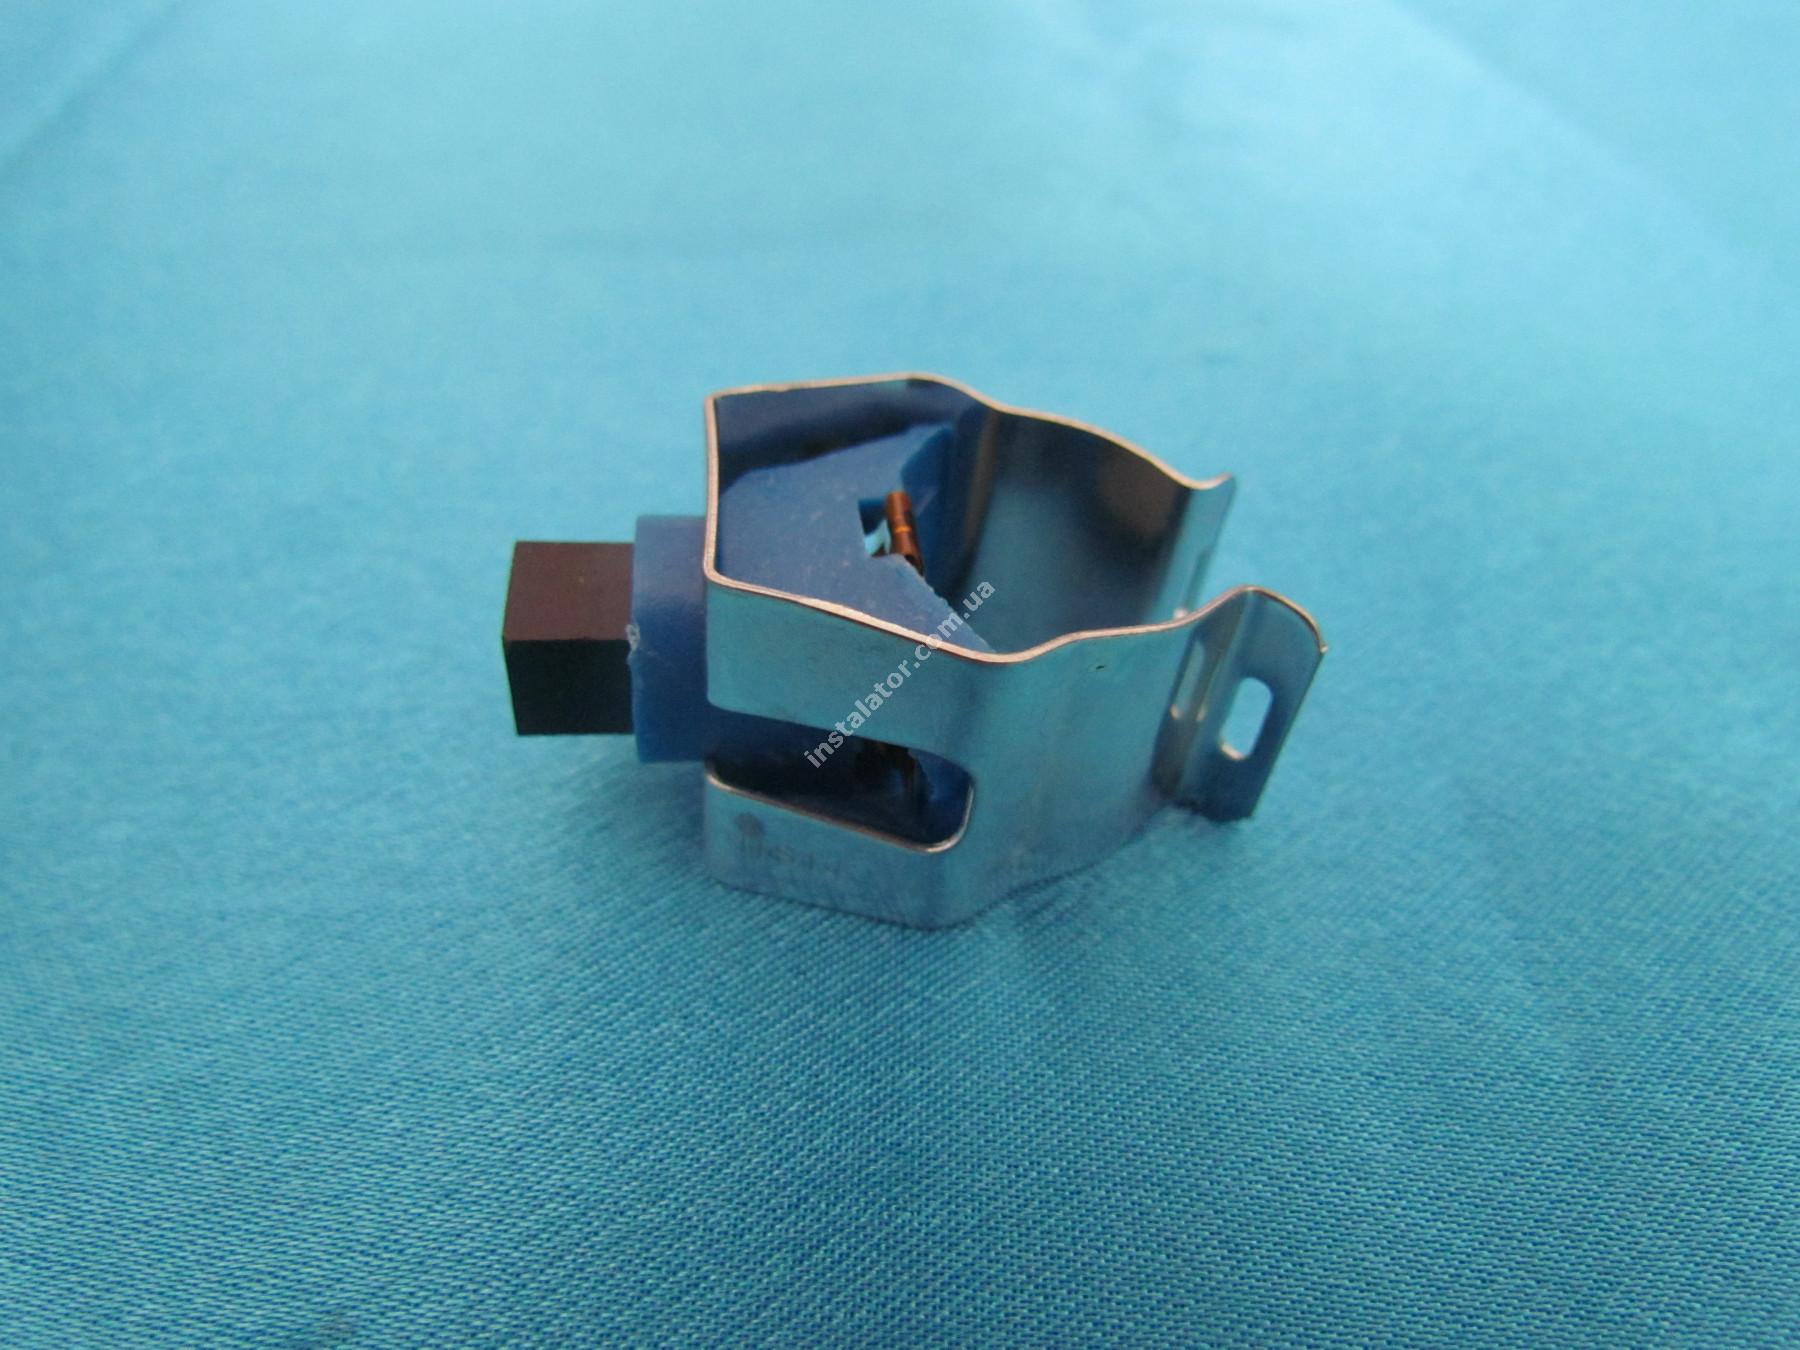 39819550 Датчик температури NTC (термостат) Ferroli DOMIproject, DOMItech,DIVATOP full-image-1